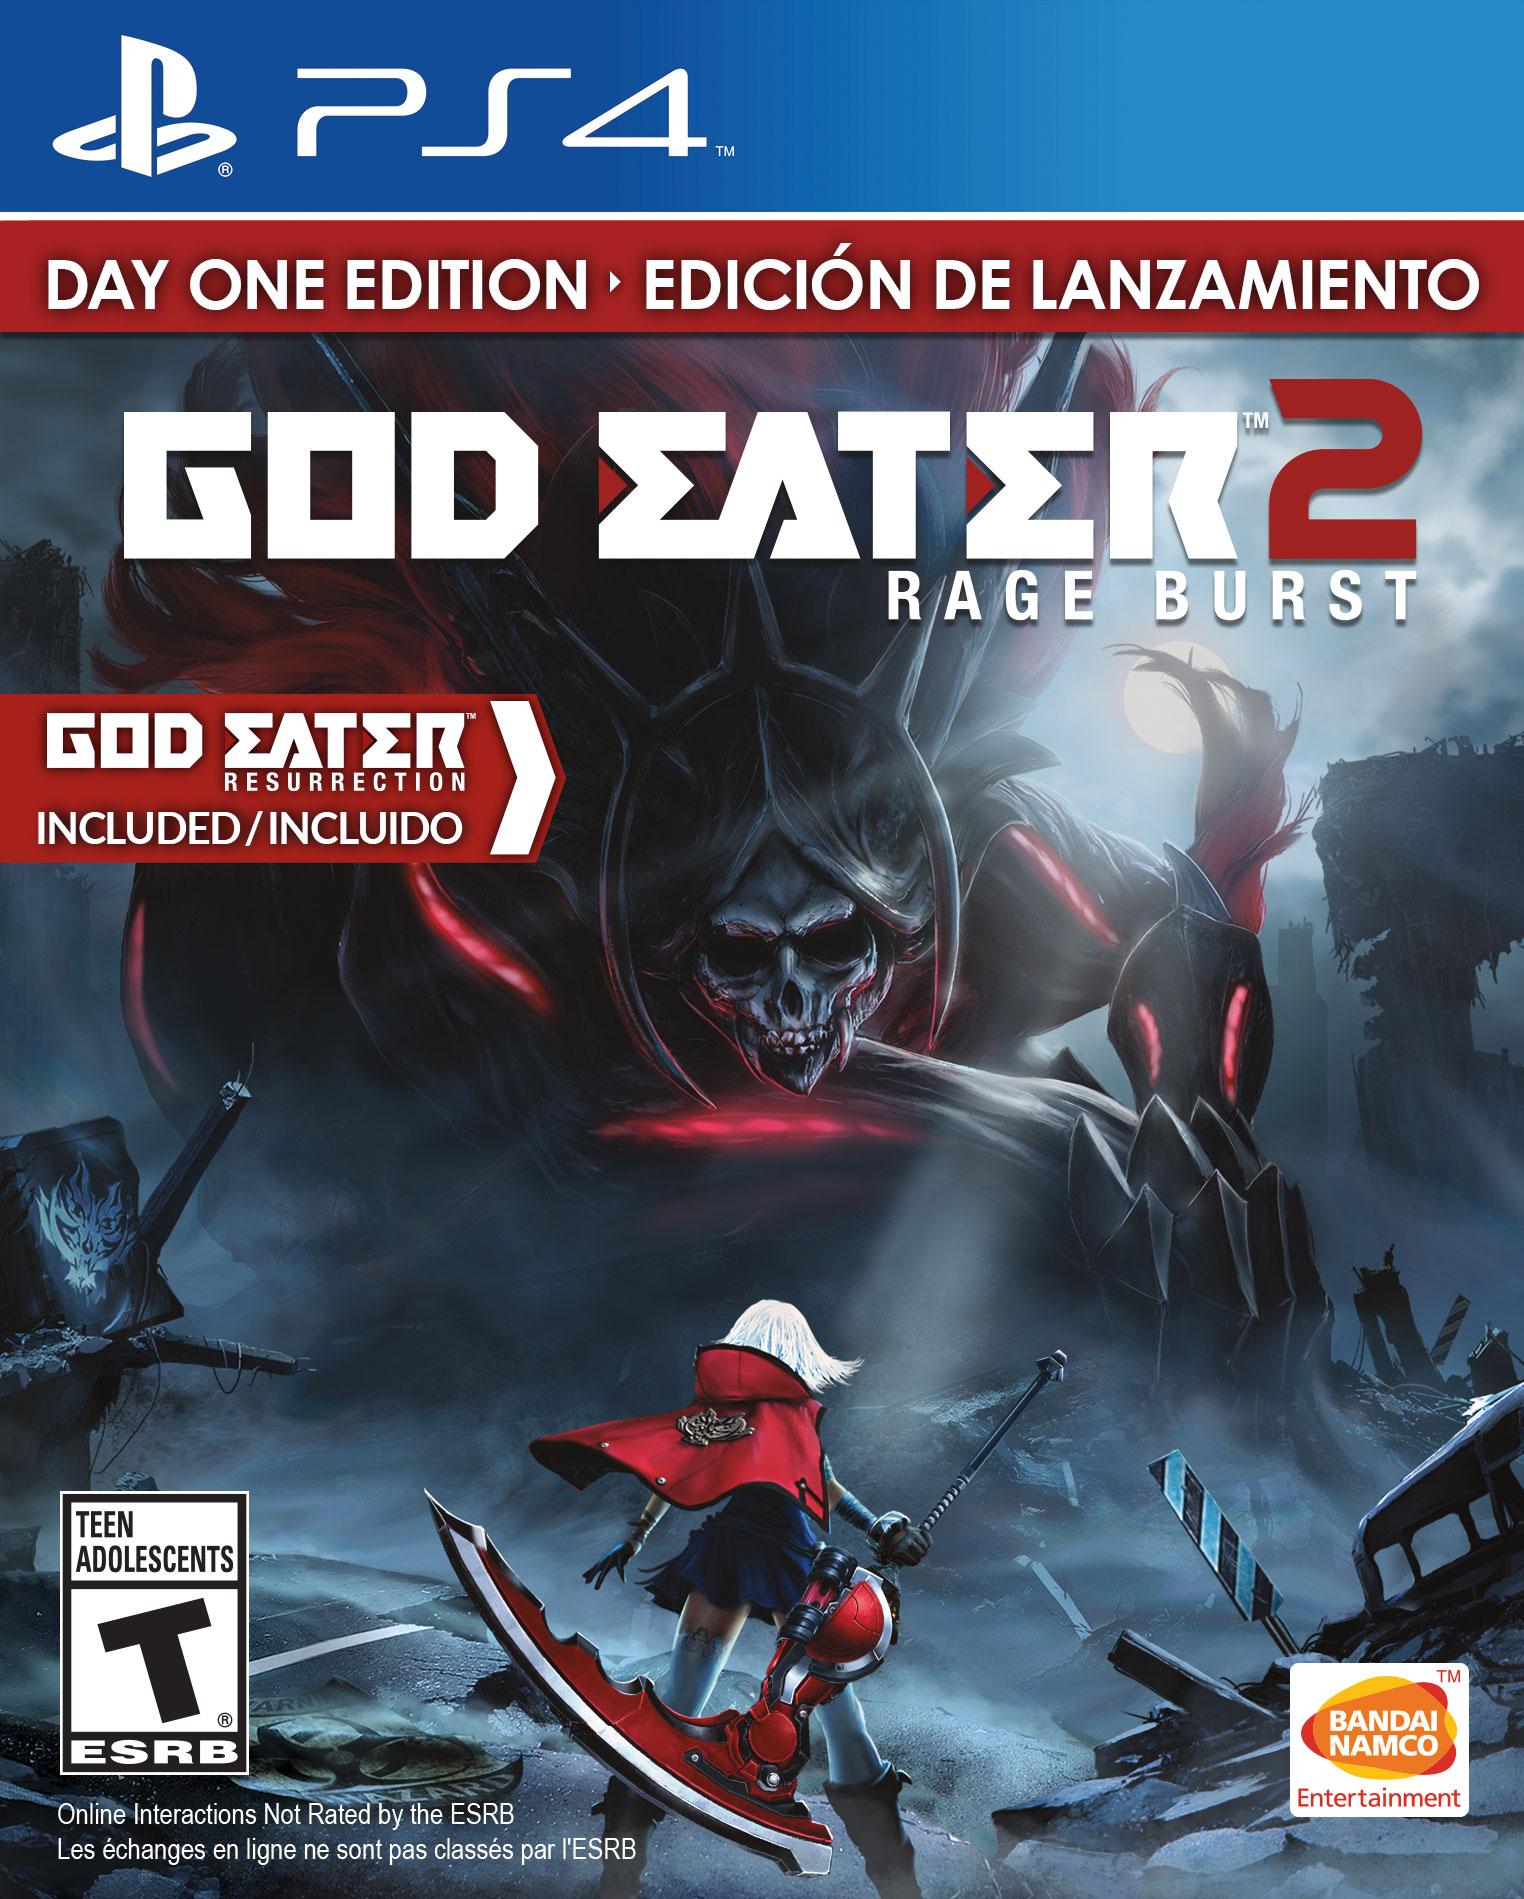 God Eater 2 Day One